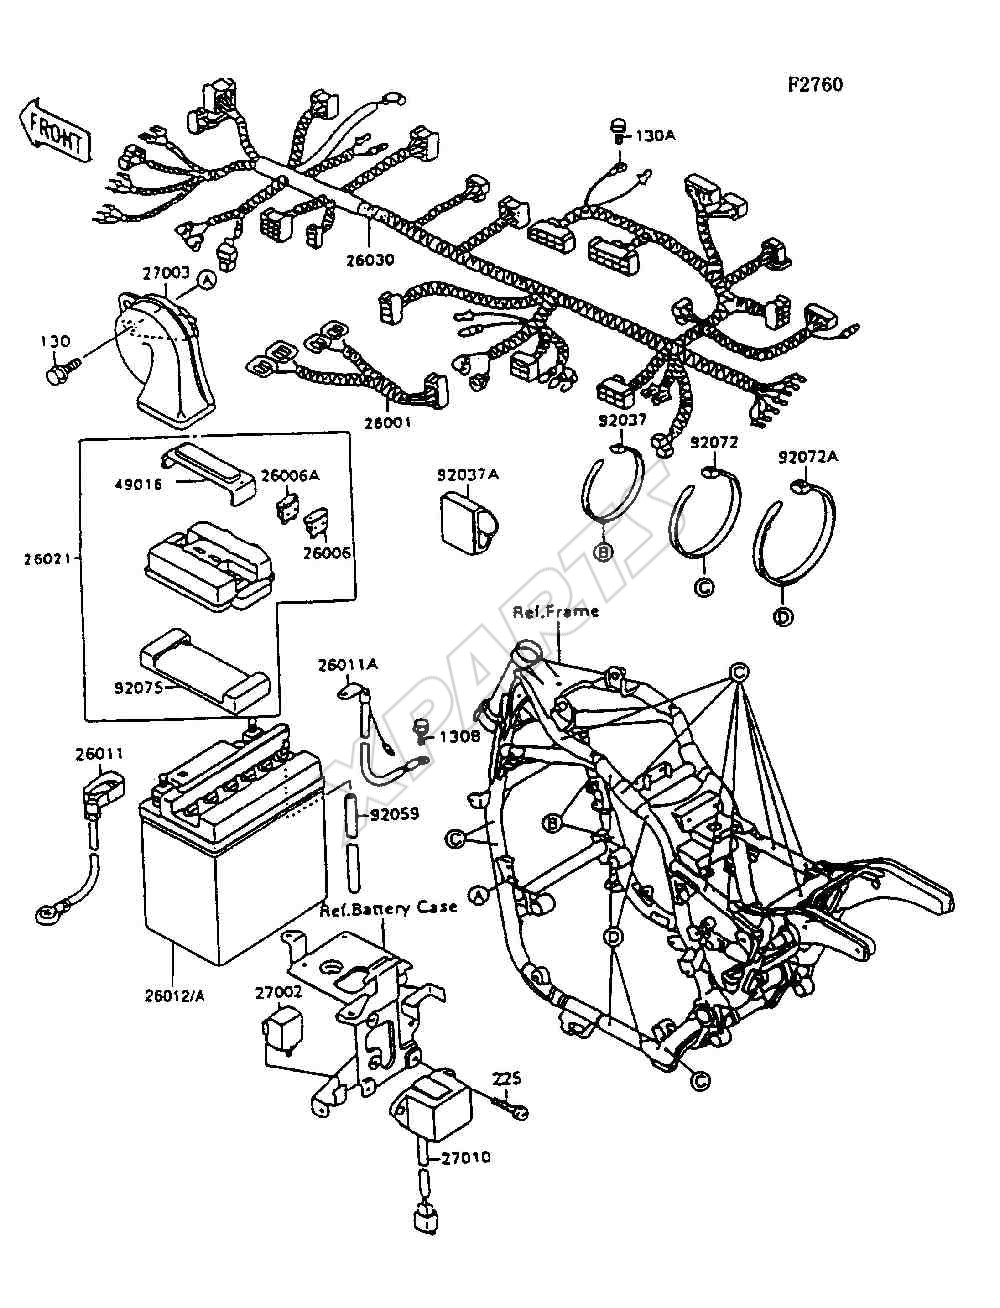 hight resolution of 1997 kawasaki vulcan 1500 wiring diagram schematics and wiring kawasaki vulcan custom 1997 vulcan 1500 l